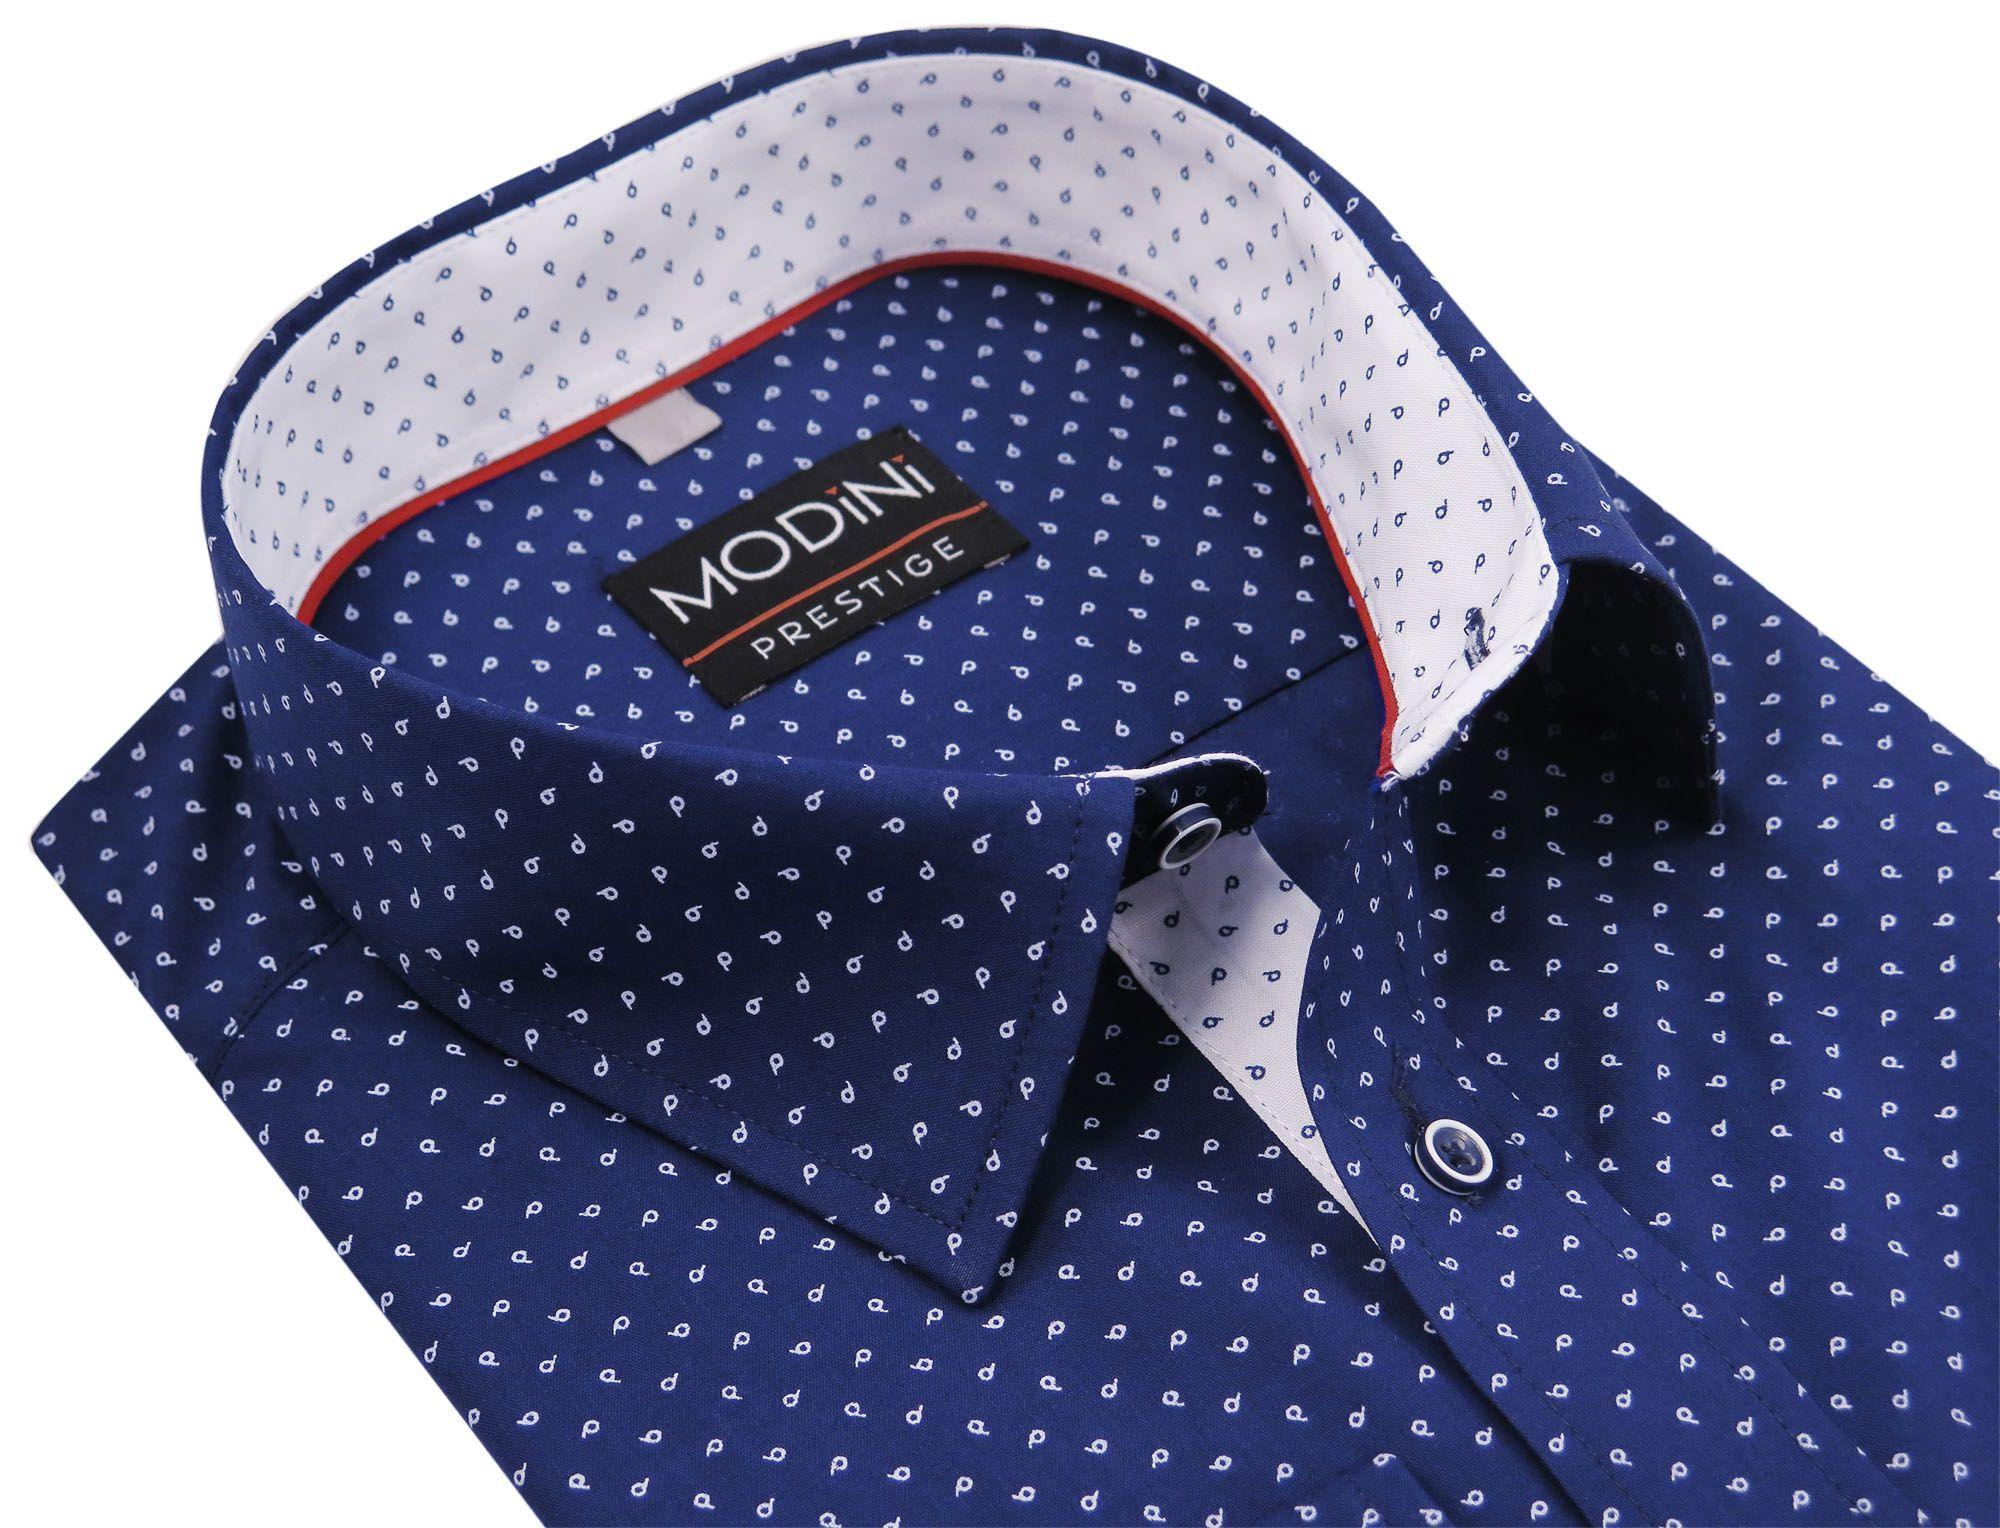 af8099c504445 Granatowa koszula łezki A21 Modini 176-182 45-REG - 7162841467 ...